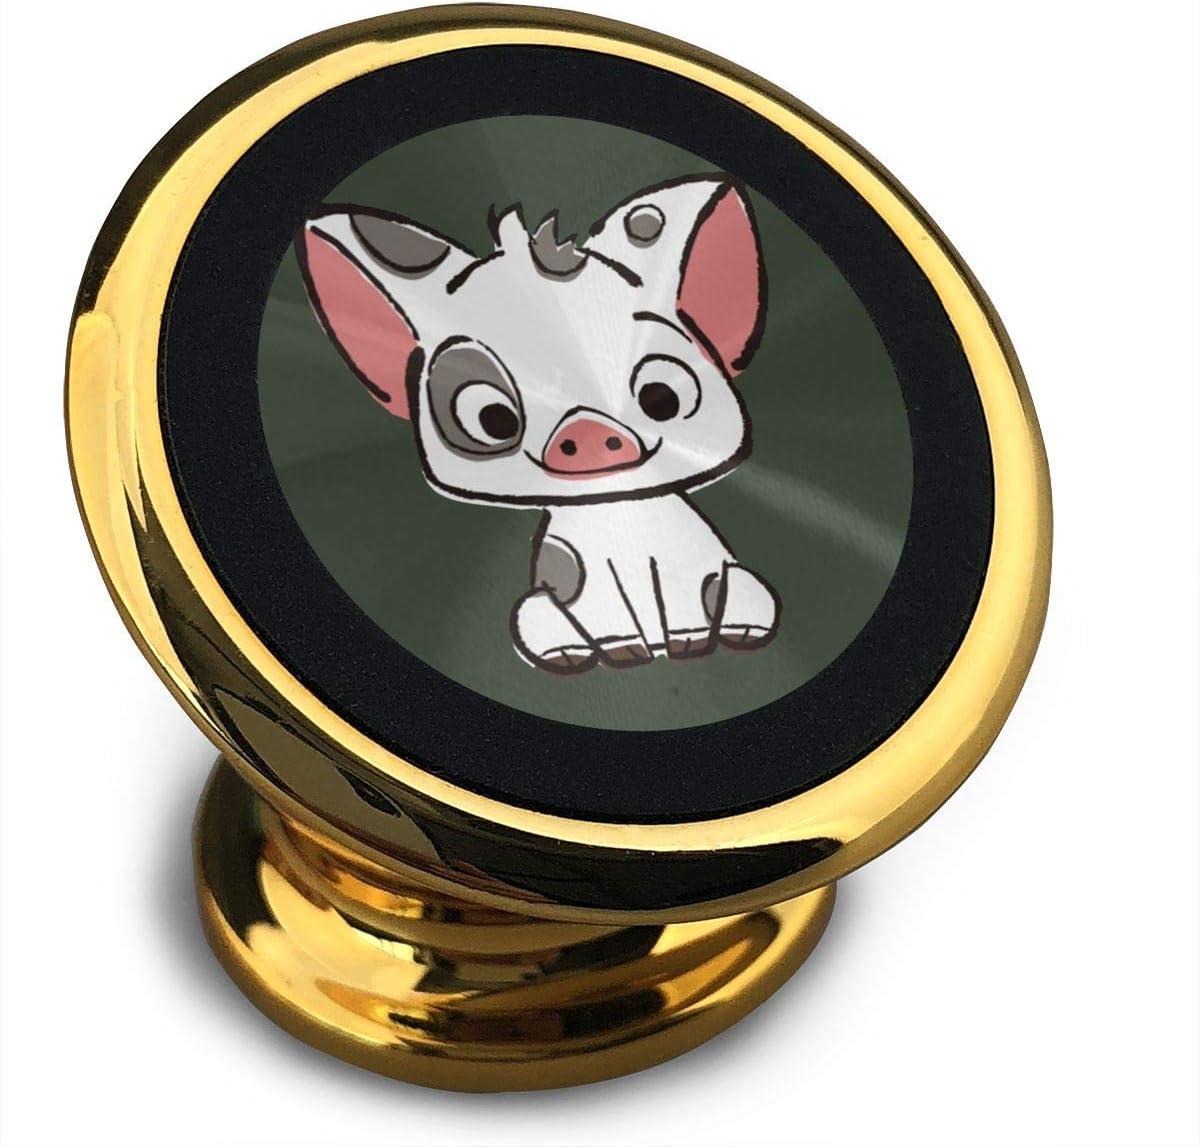 Qinf Richard Moana Pua The Pot Bellied Pig - Soporte magnético Universal para iPhone XS MAX R X 8 Plus 7 Plus 6S Samsung Galaxy S9 S8 Edge S7 S6 LG Sony